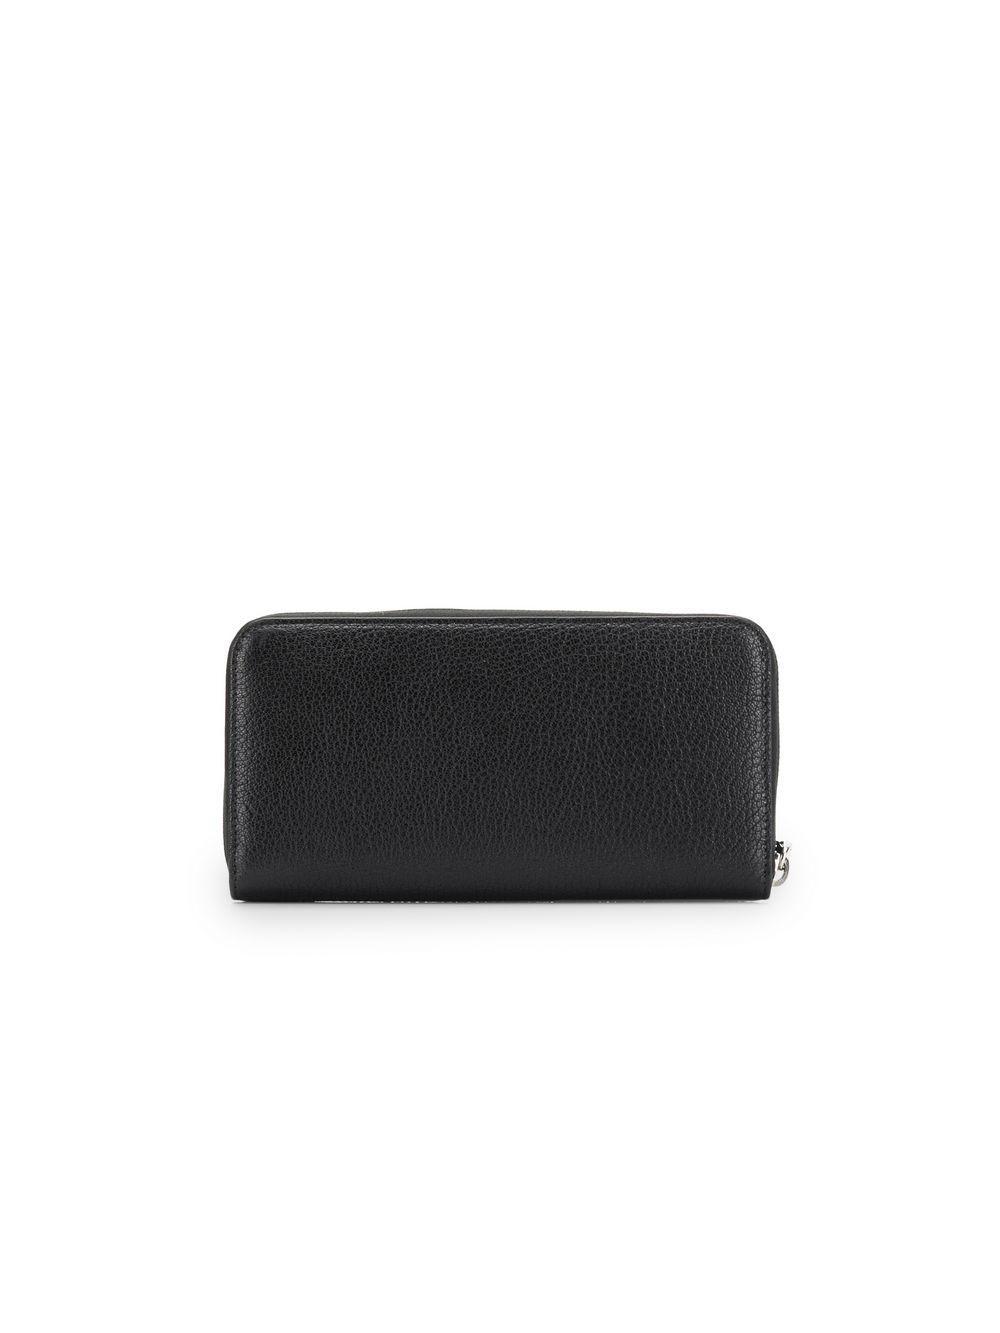 13e837c72cf6 Lyst - Miu Miu Madras Zip-around Wallet in Black - Save 27%